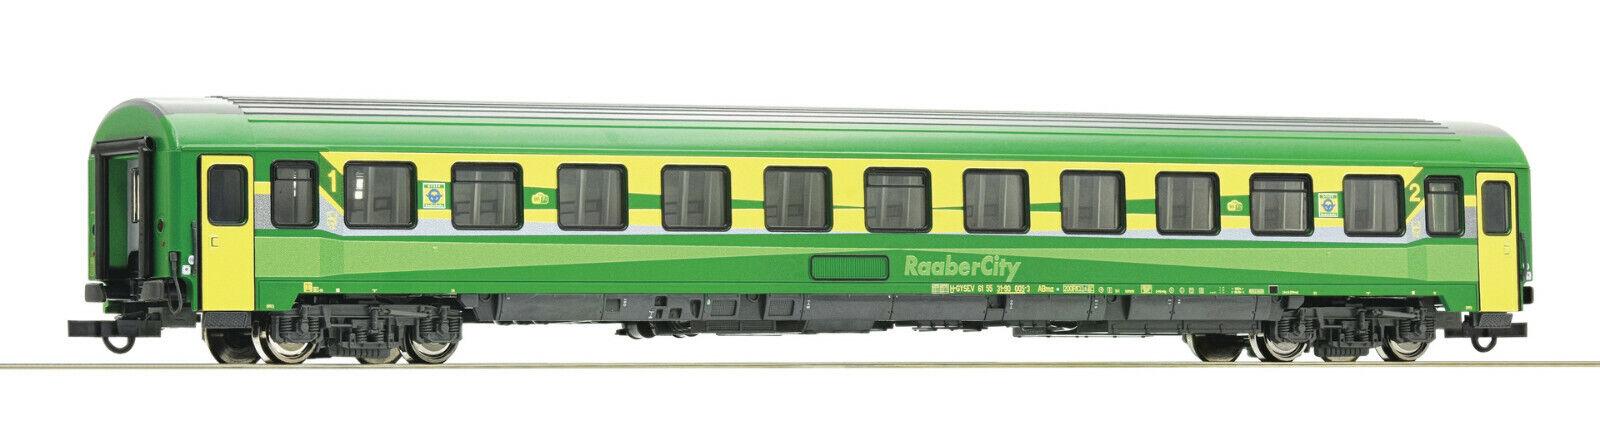 ROCO h0 74333-EUROFIMA-AUTO 1./2. classe, GySEV Merce Nuova